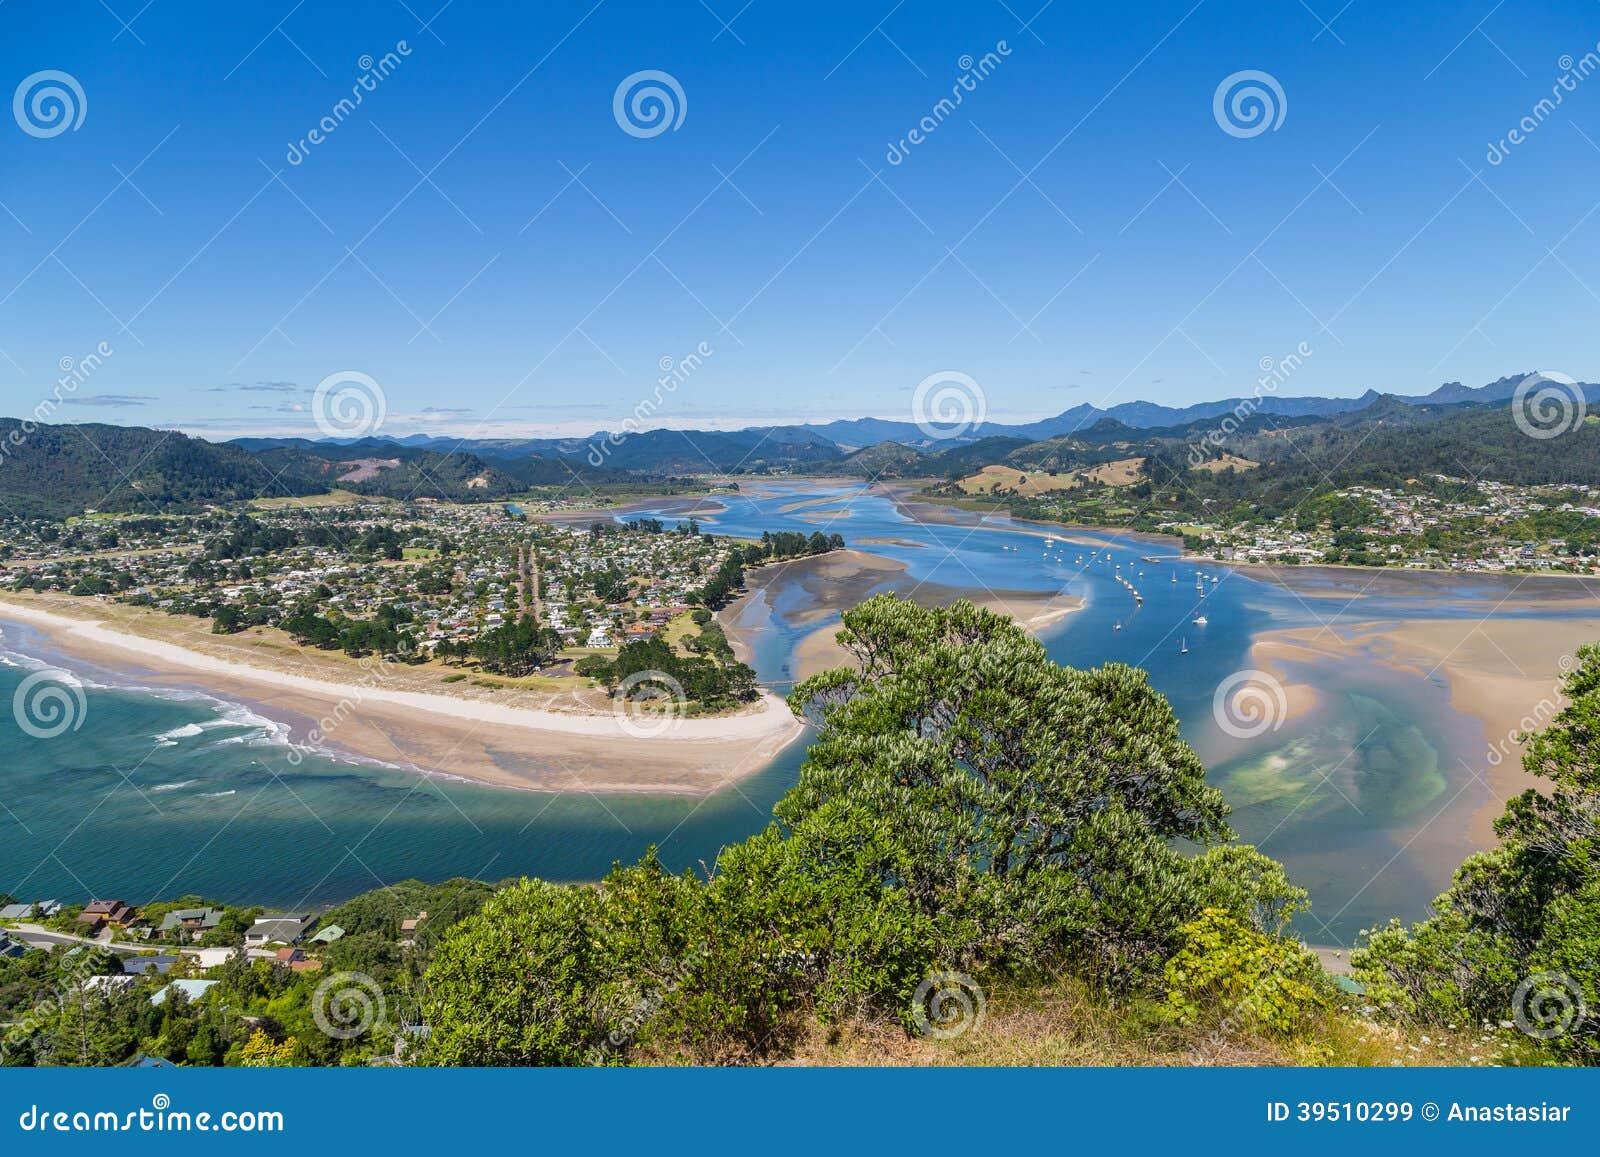 Top view to Tairua town and river, Coromandel peninsula, New Zealand